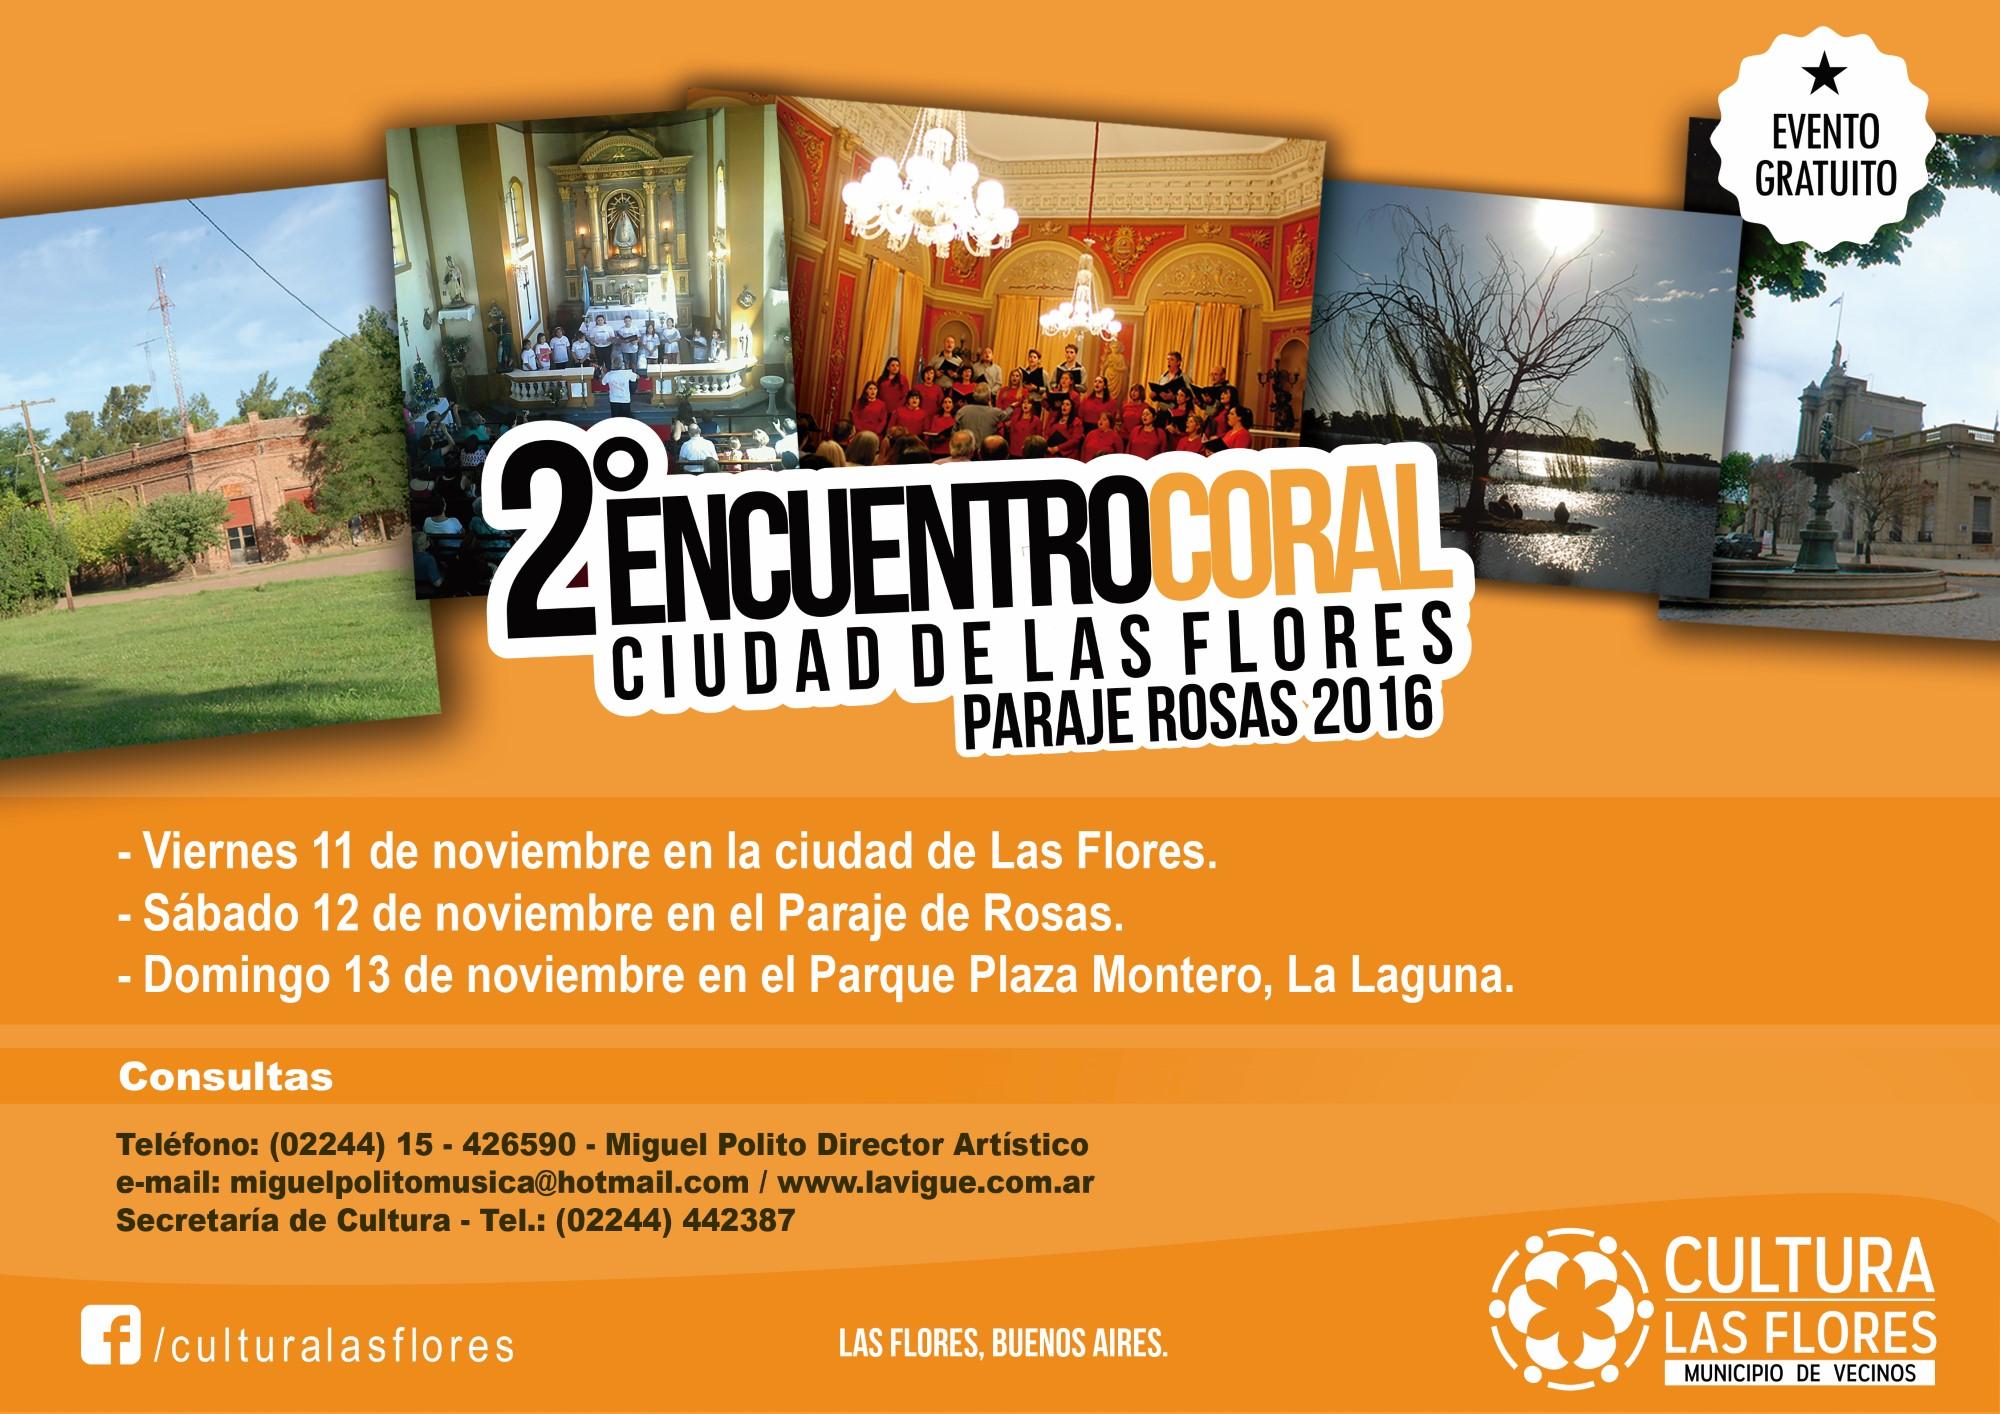 afiche-general-encuentro-coral-rosas-provincia-custom